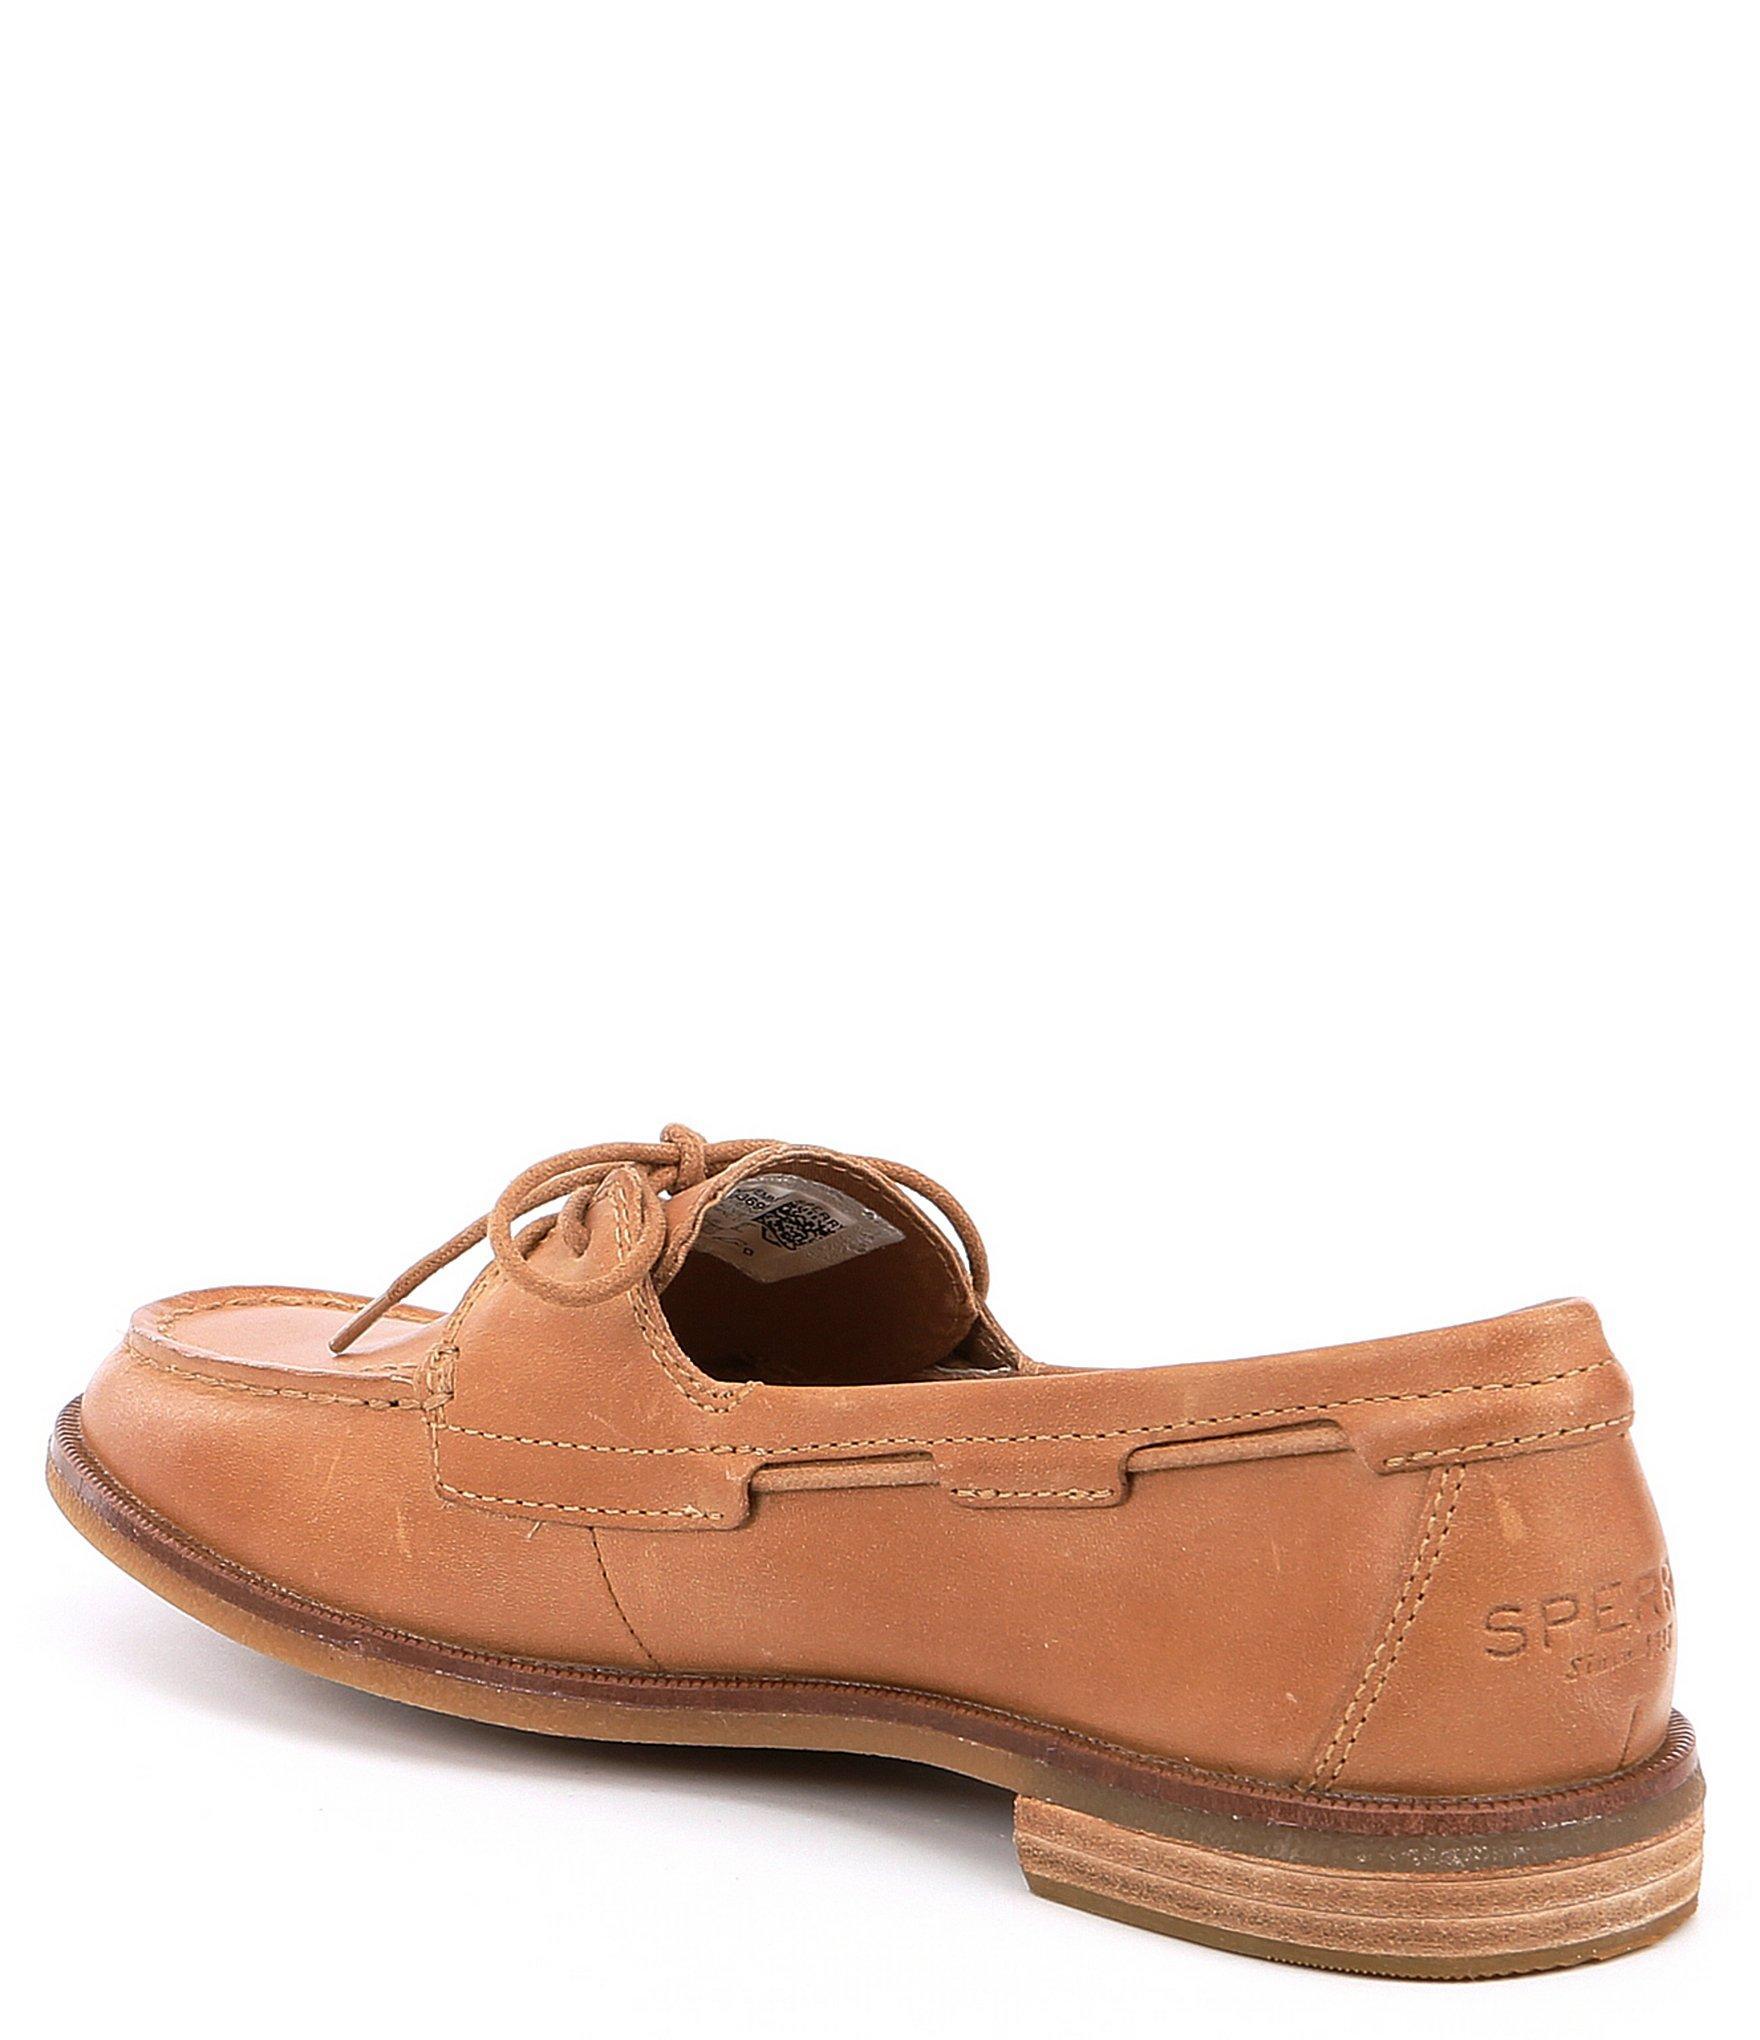 b98fa5dfd49cf Brown Women's Seaport Boat Shoes